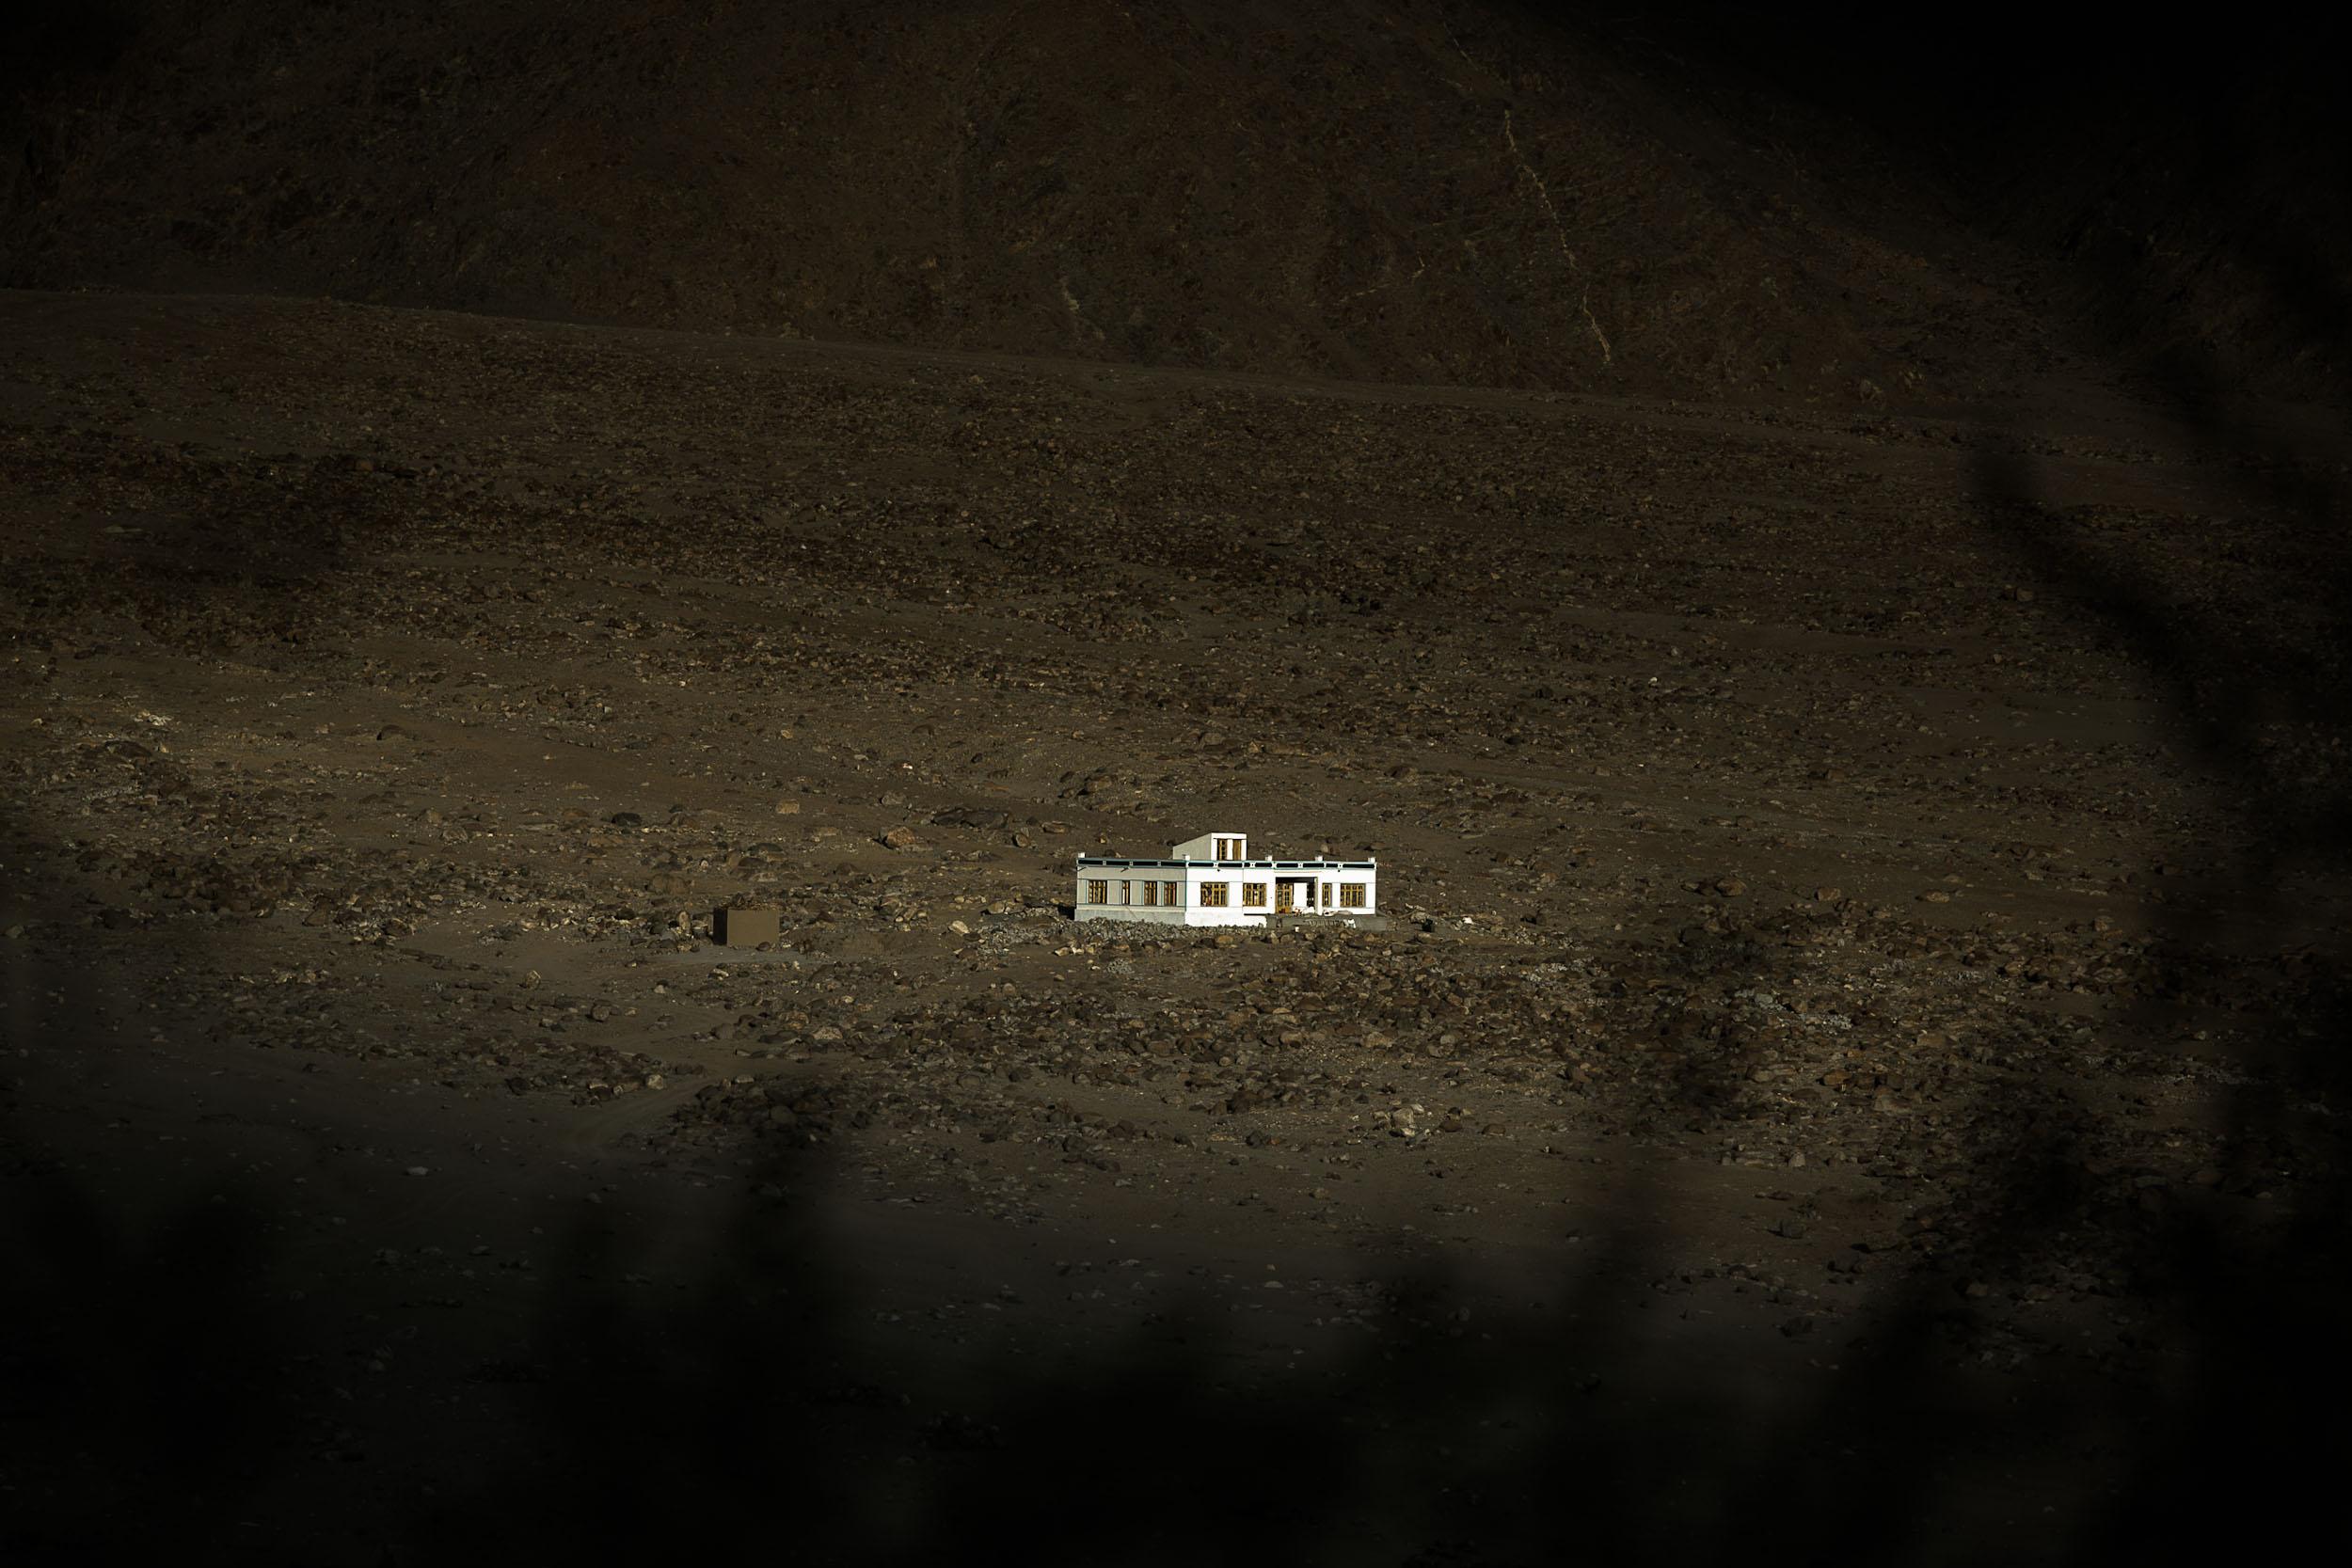 Sindhur_Photography_Travel_Landscape_Ladakh-22.JPG